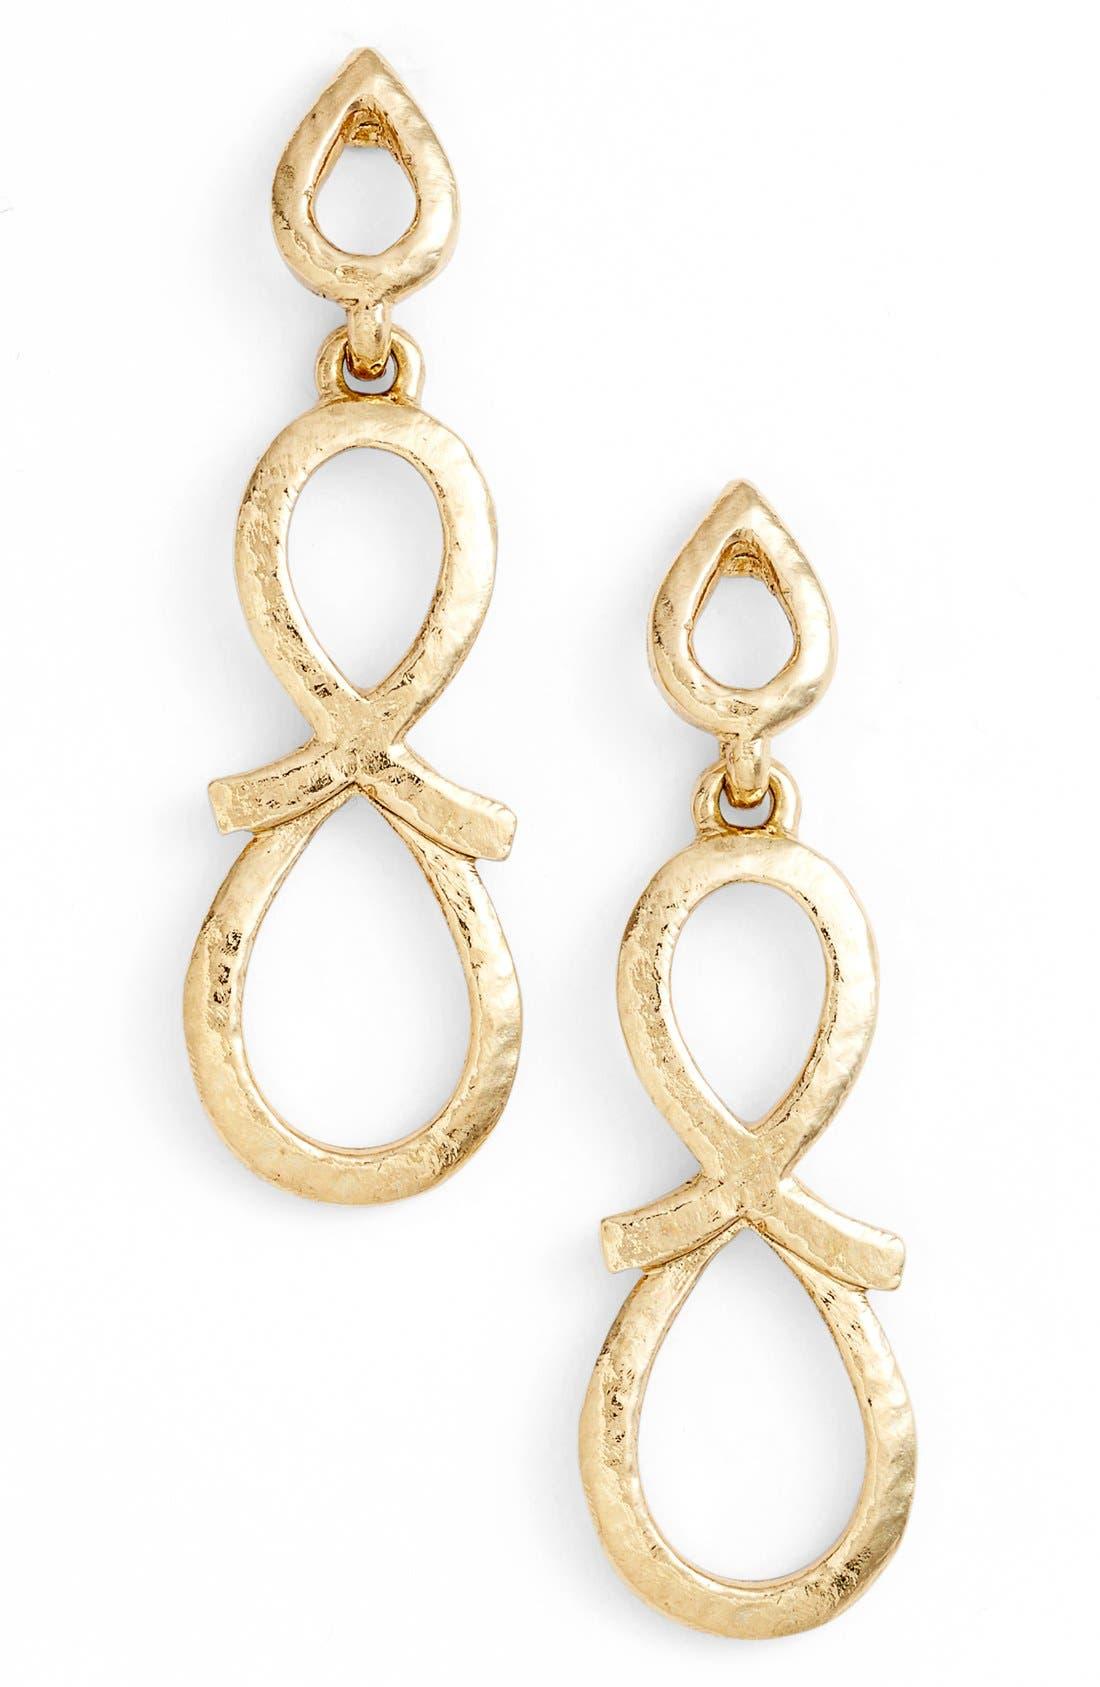 Main Image - Oscar de la Renta 'Infinity Loop' Drop Earrings